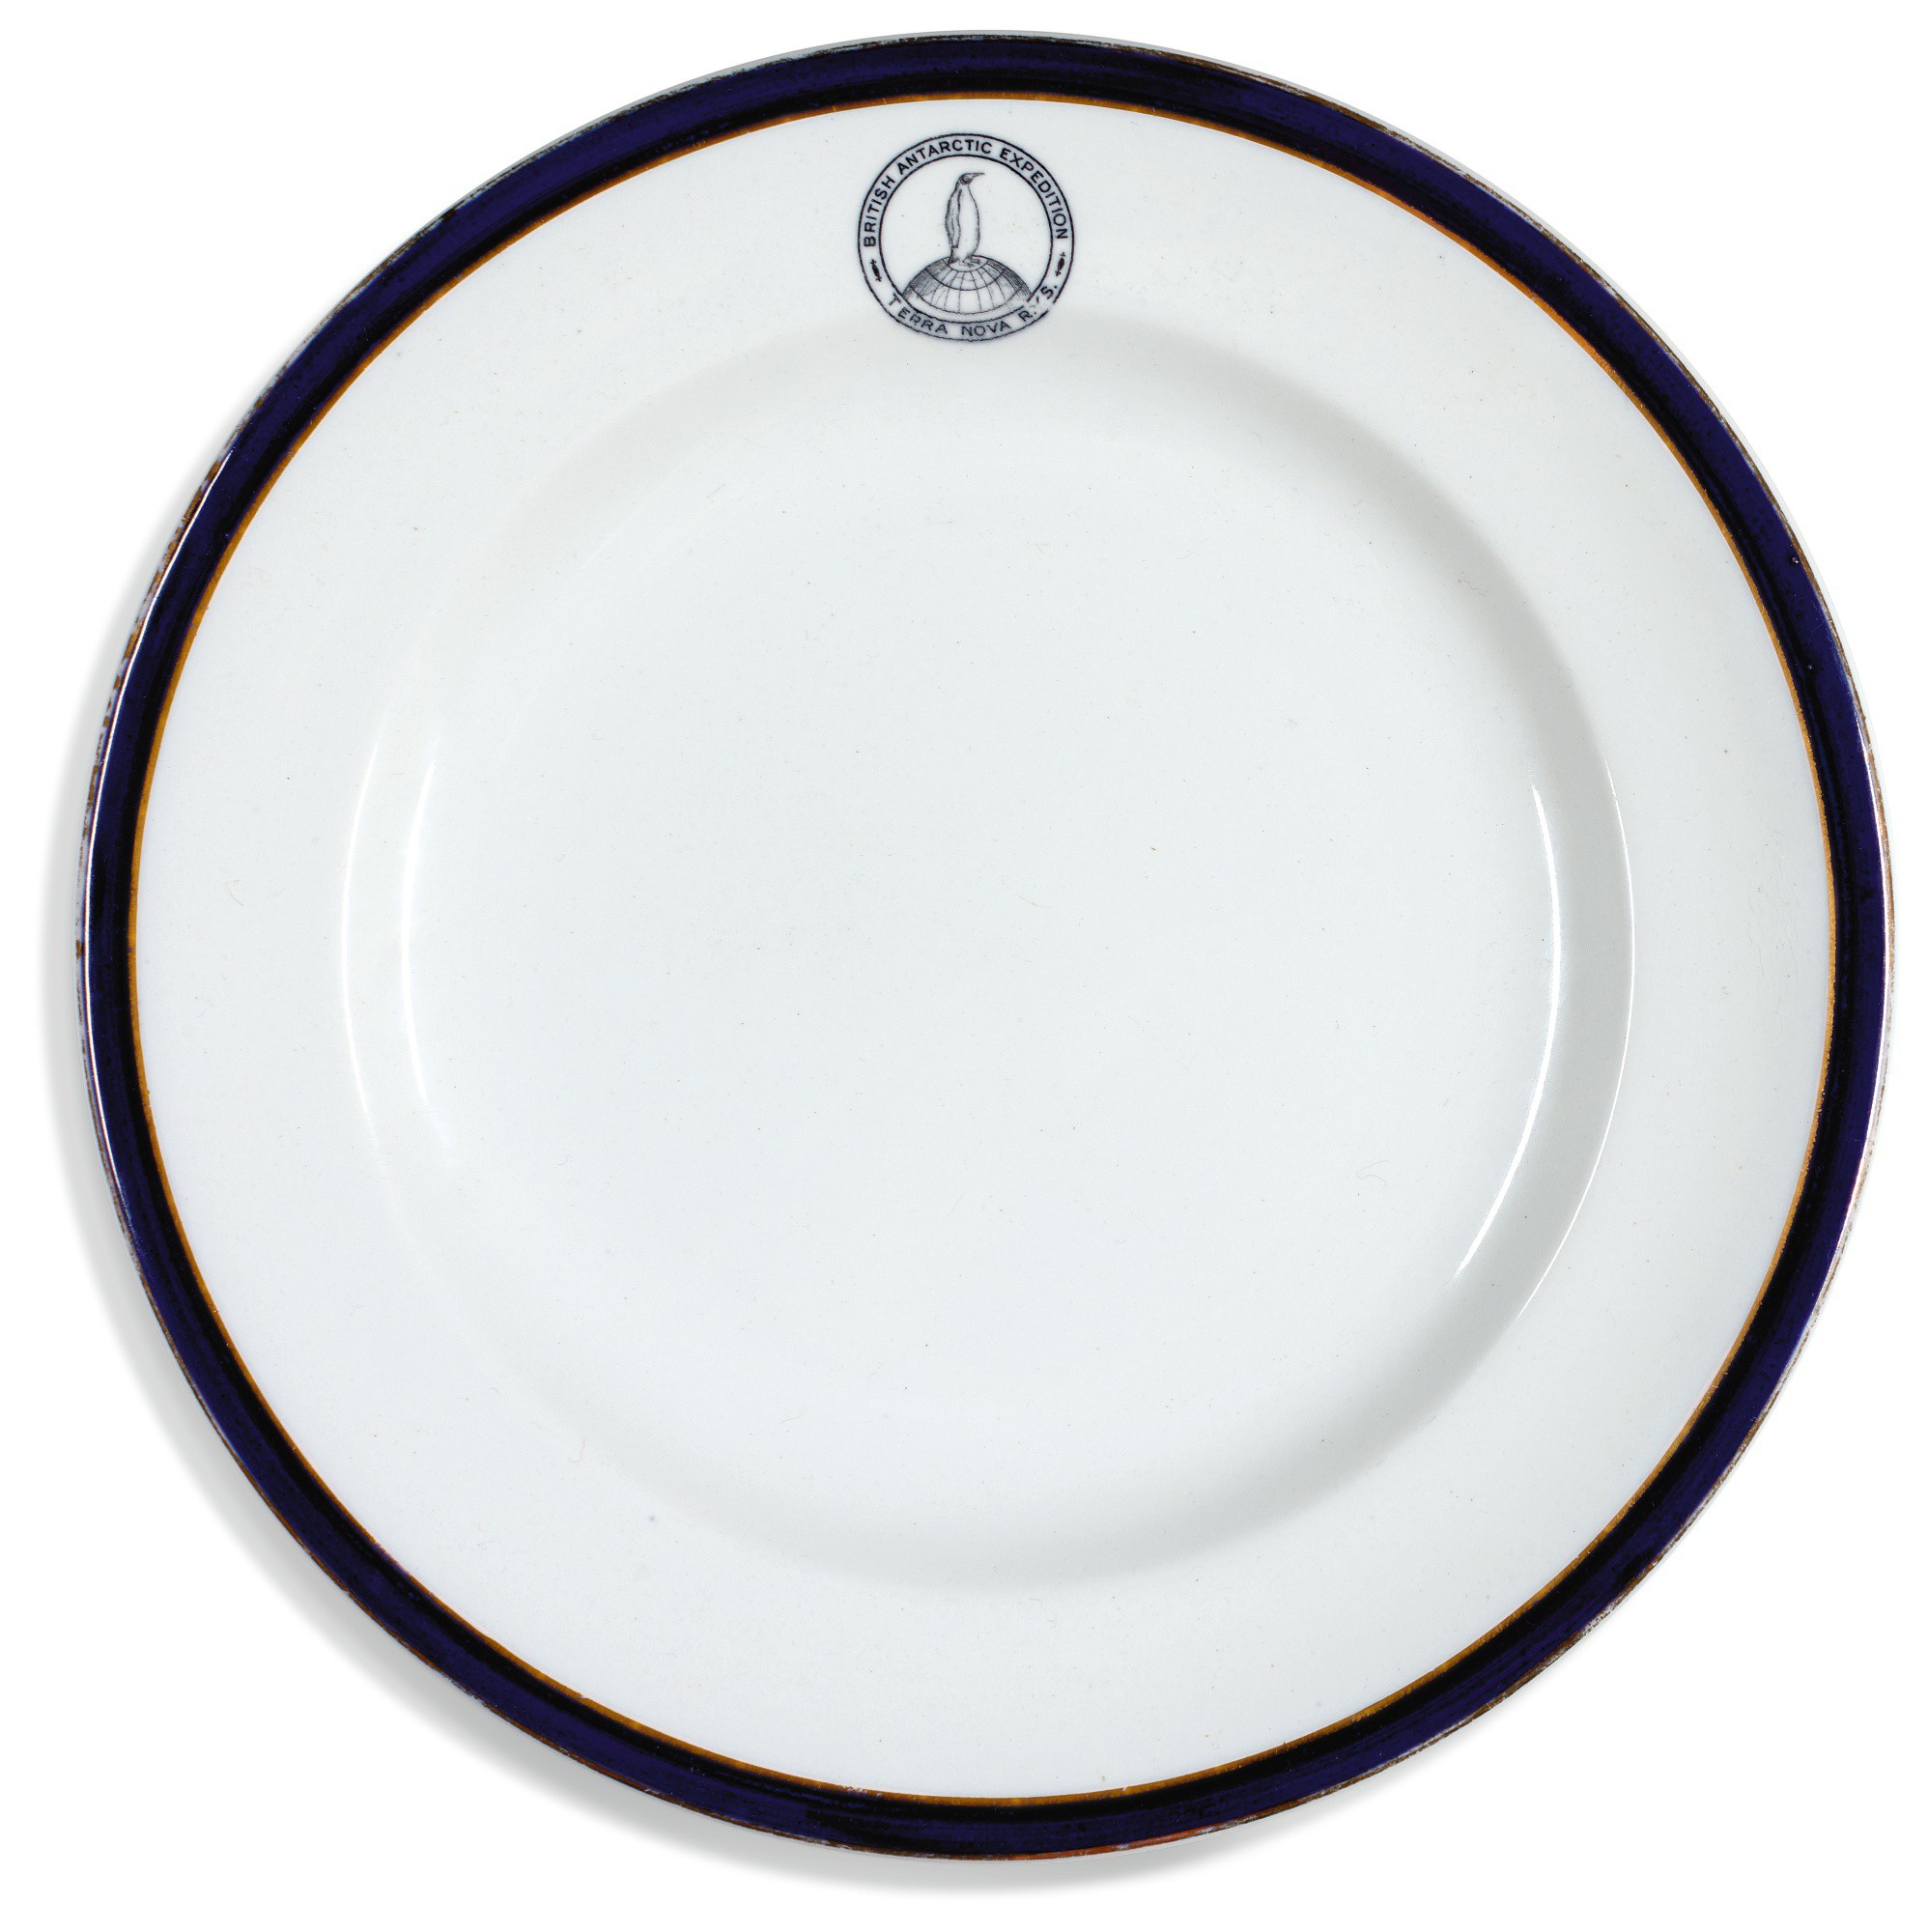 Dinner plate from the British Antarctic Expedition (Terra Nova), 1910-1913   Dunn Bennett Patent